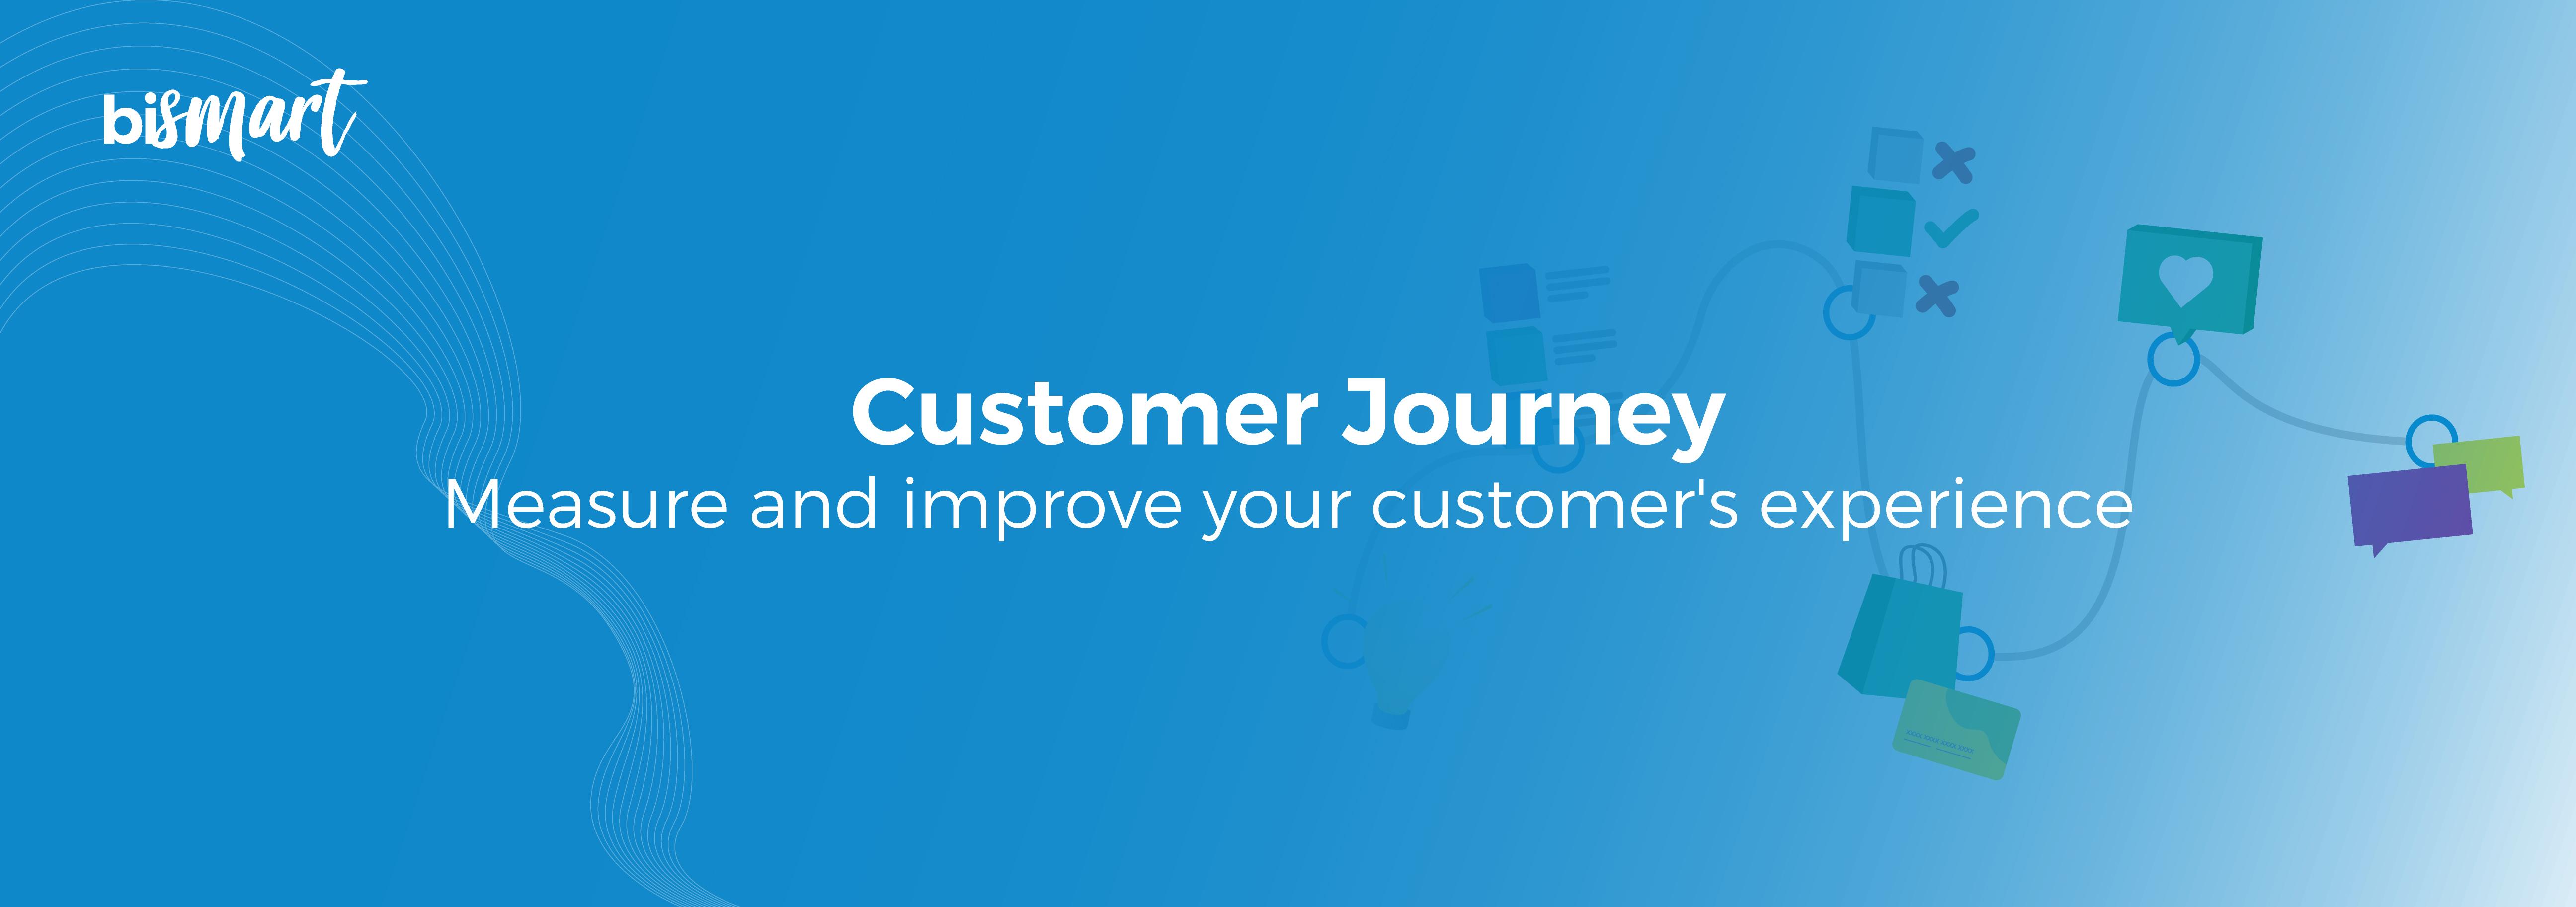 Customer-Journey-Landing-EN